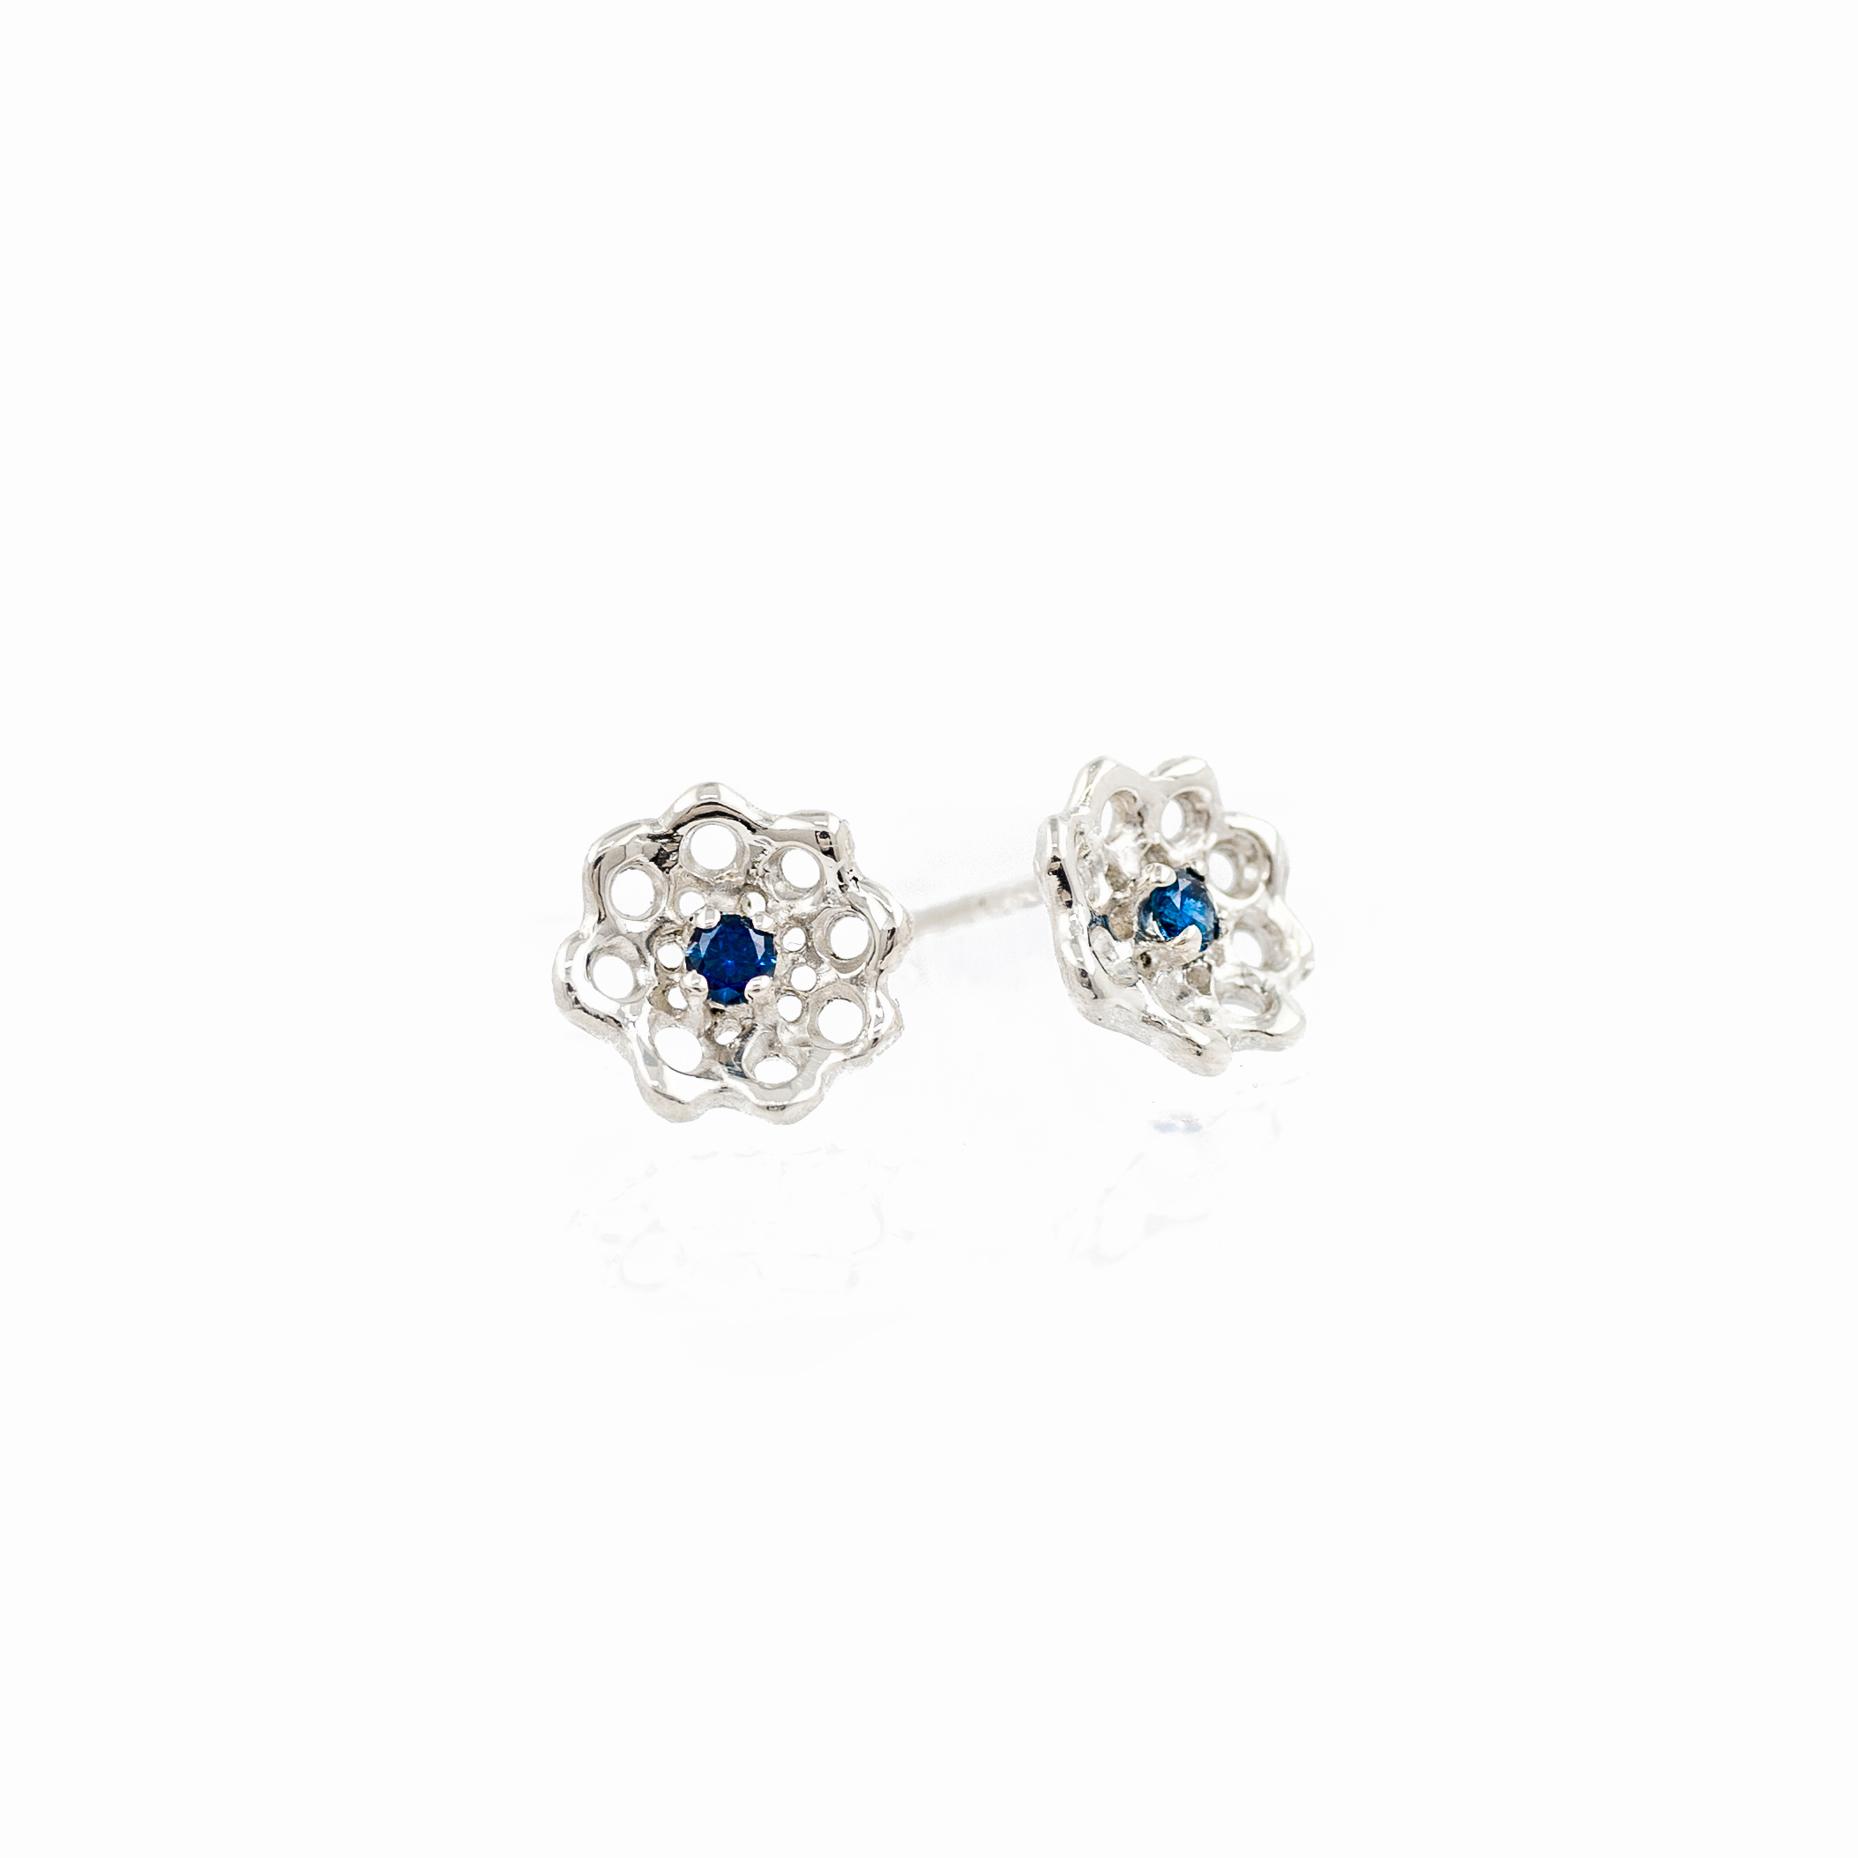 Silver Cusp Earrings: sterling silver, Australian blue sapphires.